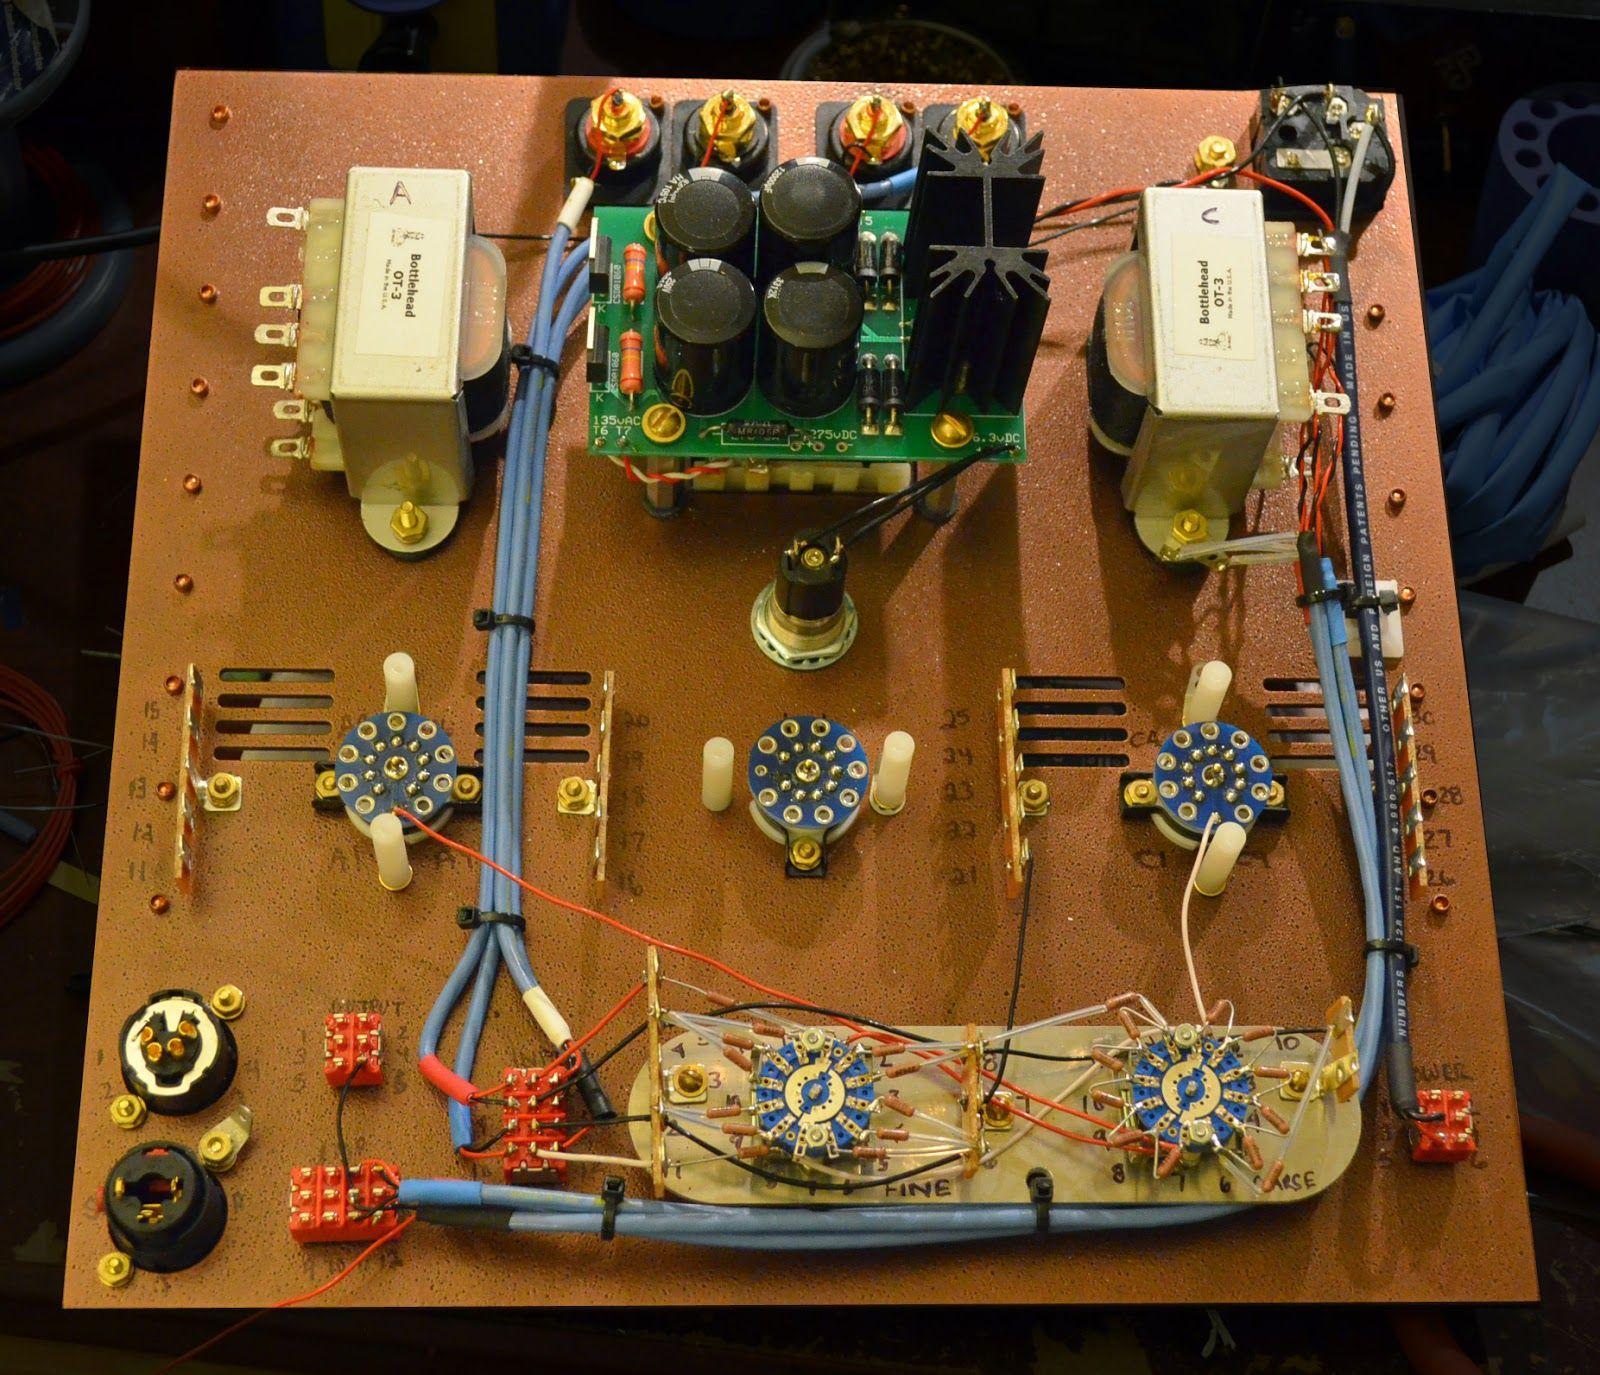 Bottlehead Mainline Diy Audio Electronics From Zynsonixcom The Class D Schematic Help Needed Diyaudio